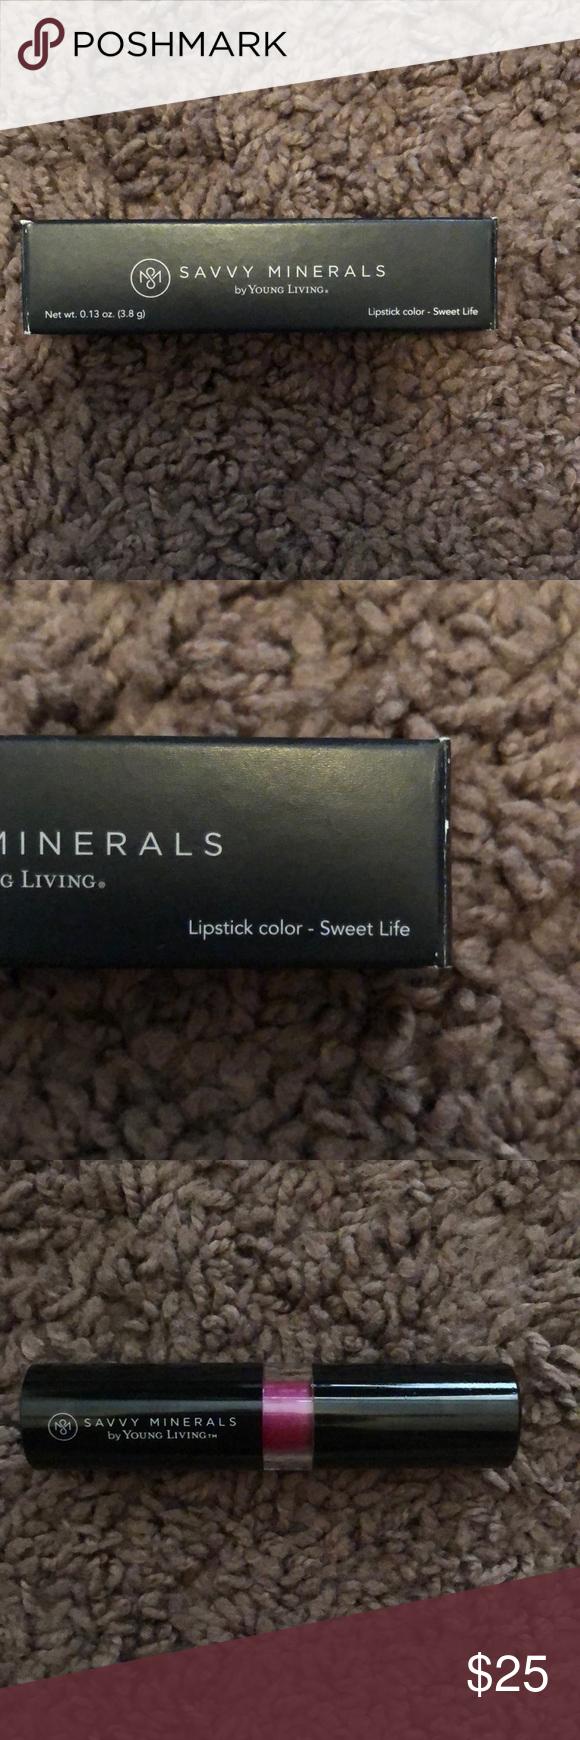 Photo of NWT! Savvy Minerals Sweet Life Lipstick BRAND NEW IN THE BOX! Savvy Minerals Ta …